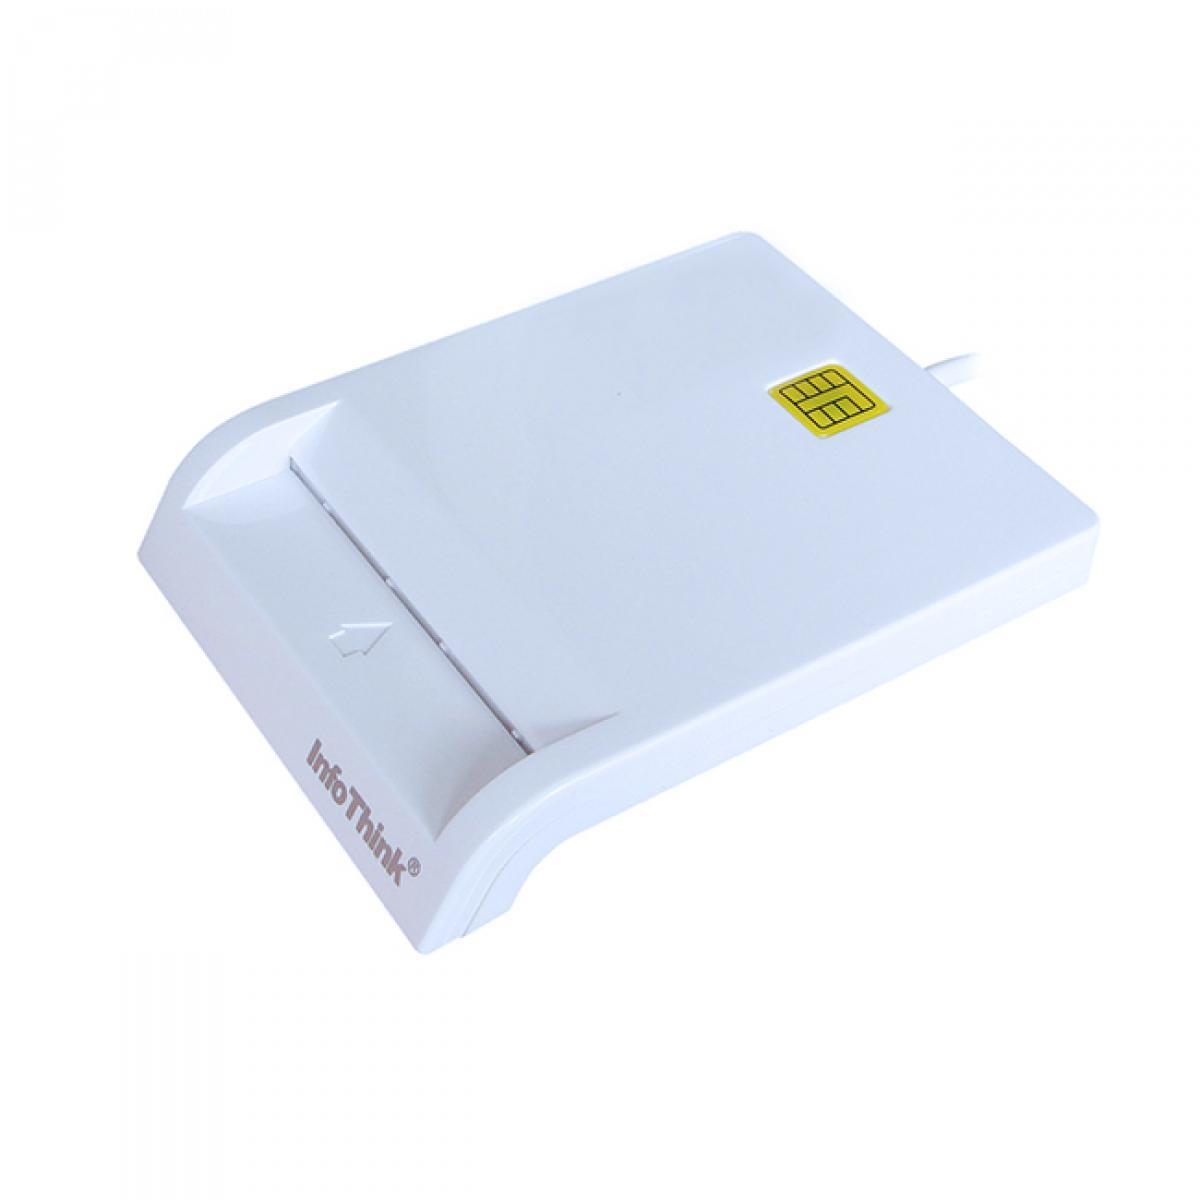 InfoThink IT-500U 多功能晶片讀卡機/ ICASH 自然人憑證